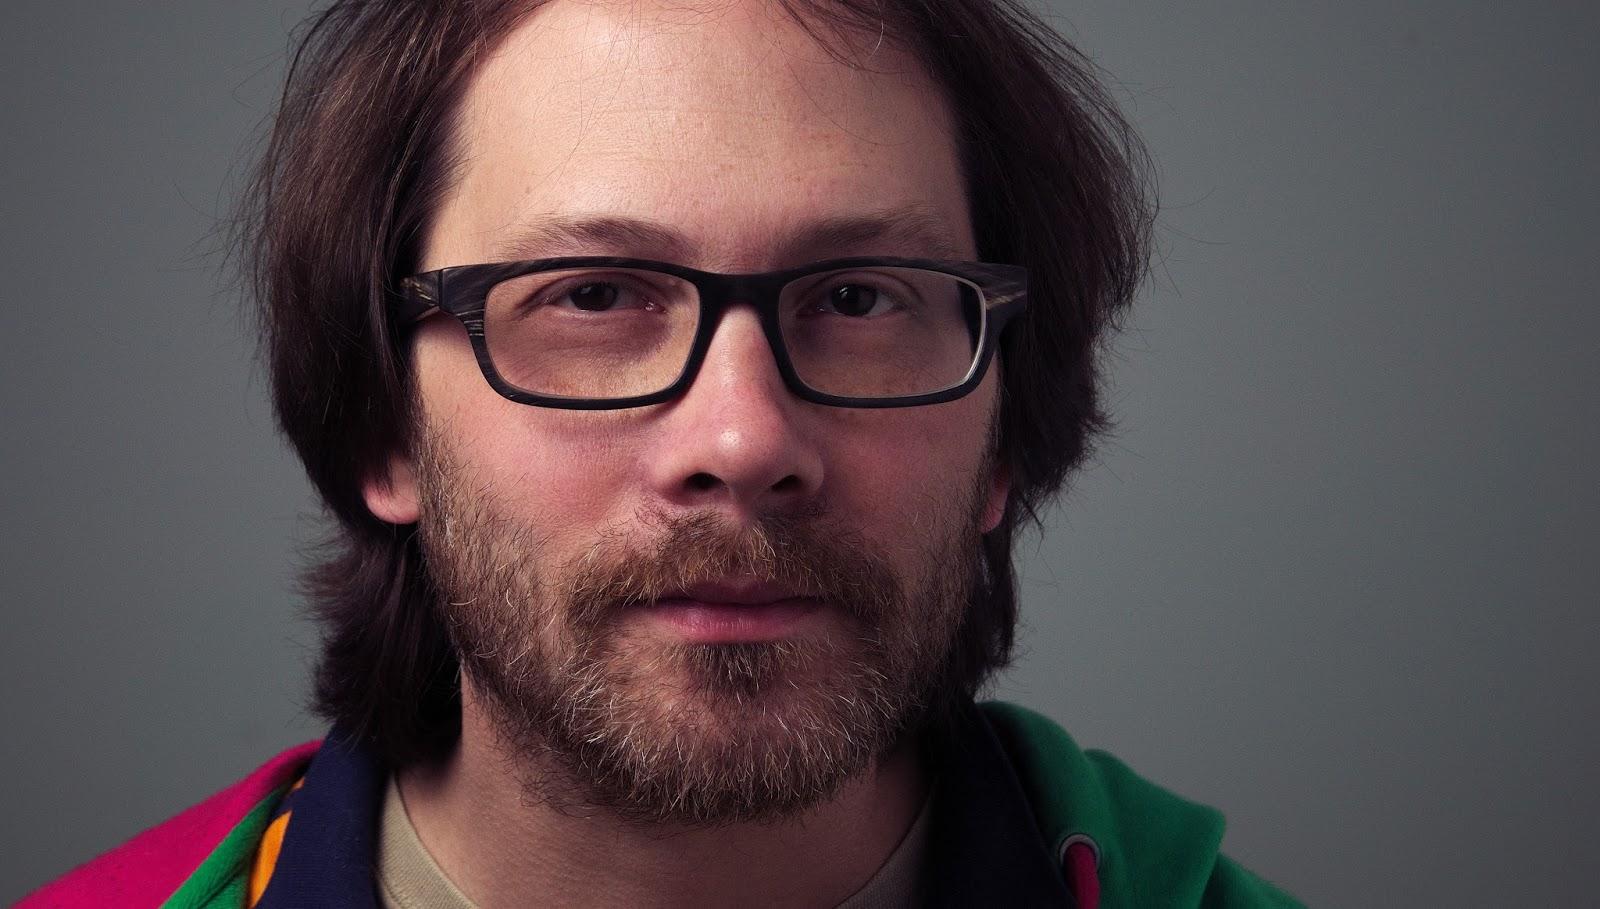 GIMP Team Mitch headshot portrait LGM Pat David